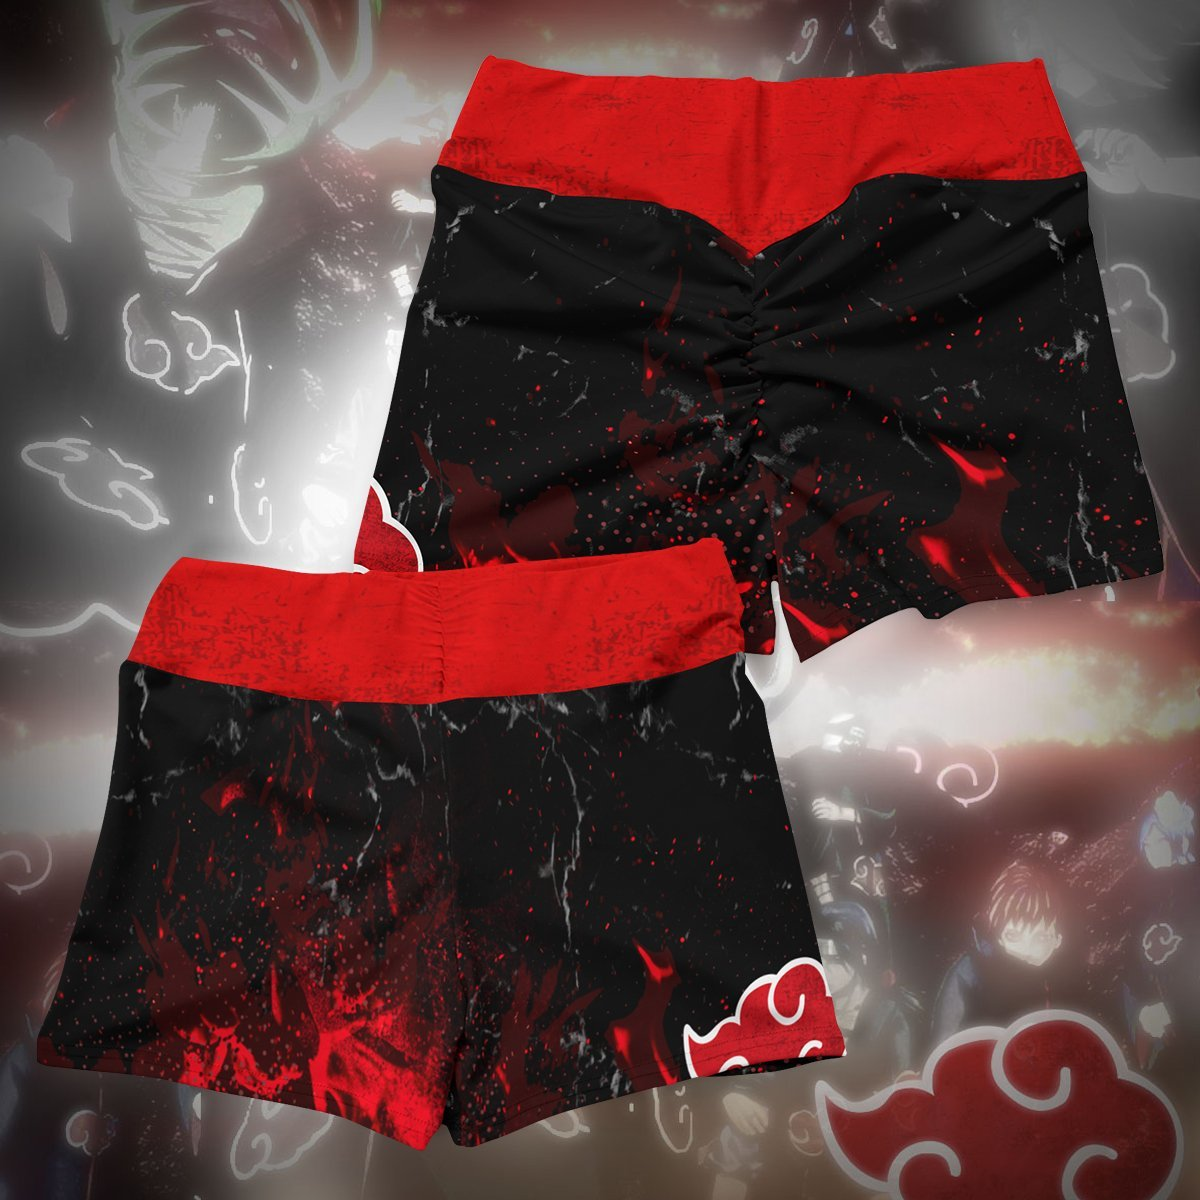 naruto akatsuki pride active wear set 418687 - Anime Swimsuits